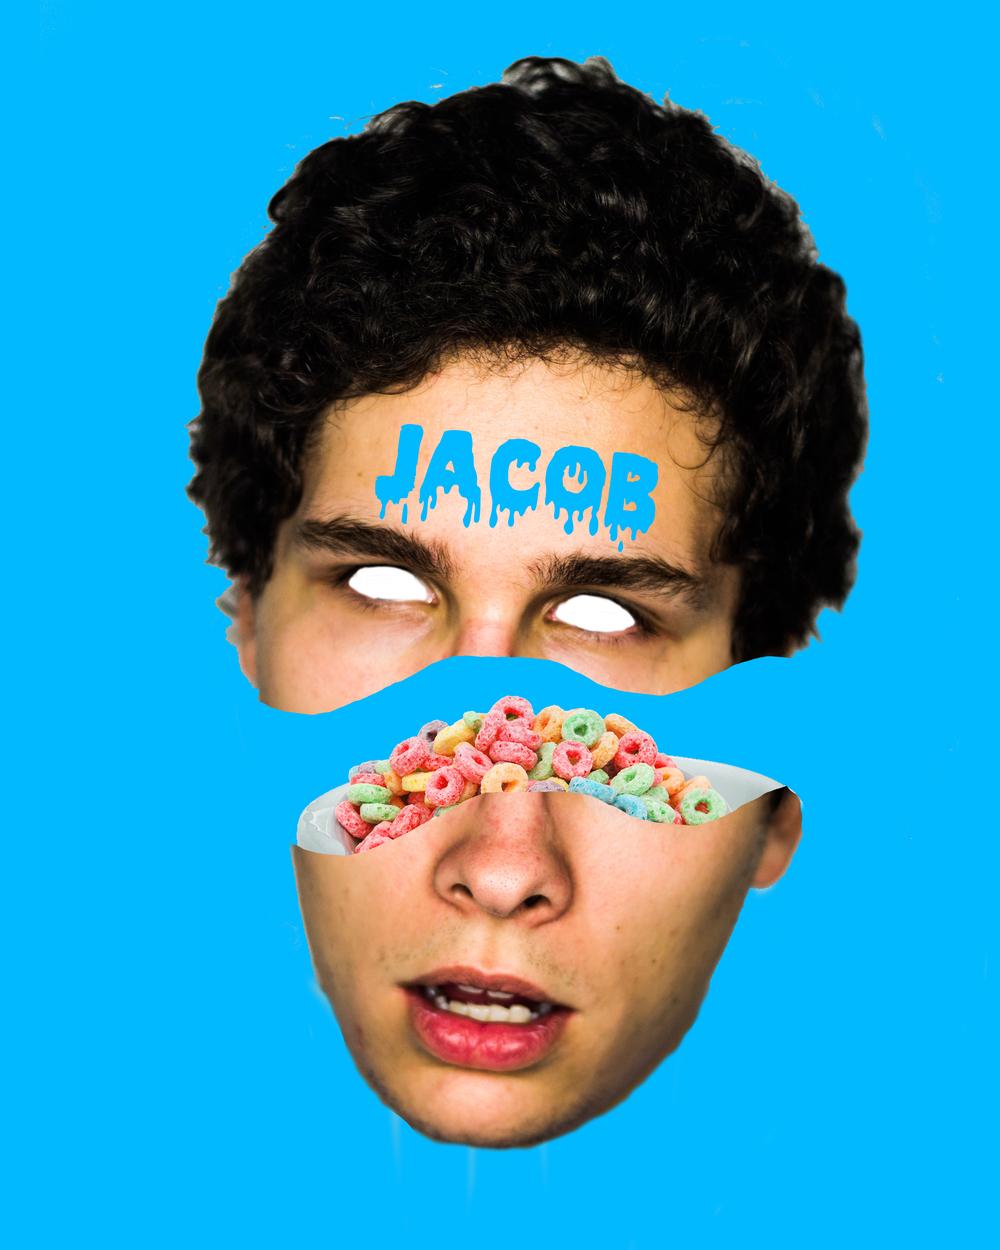 jacob head split for print.jpg